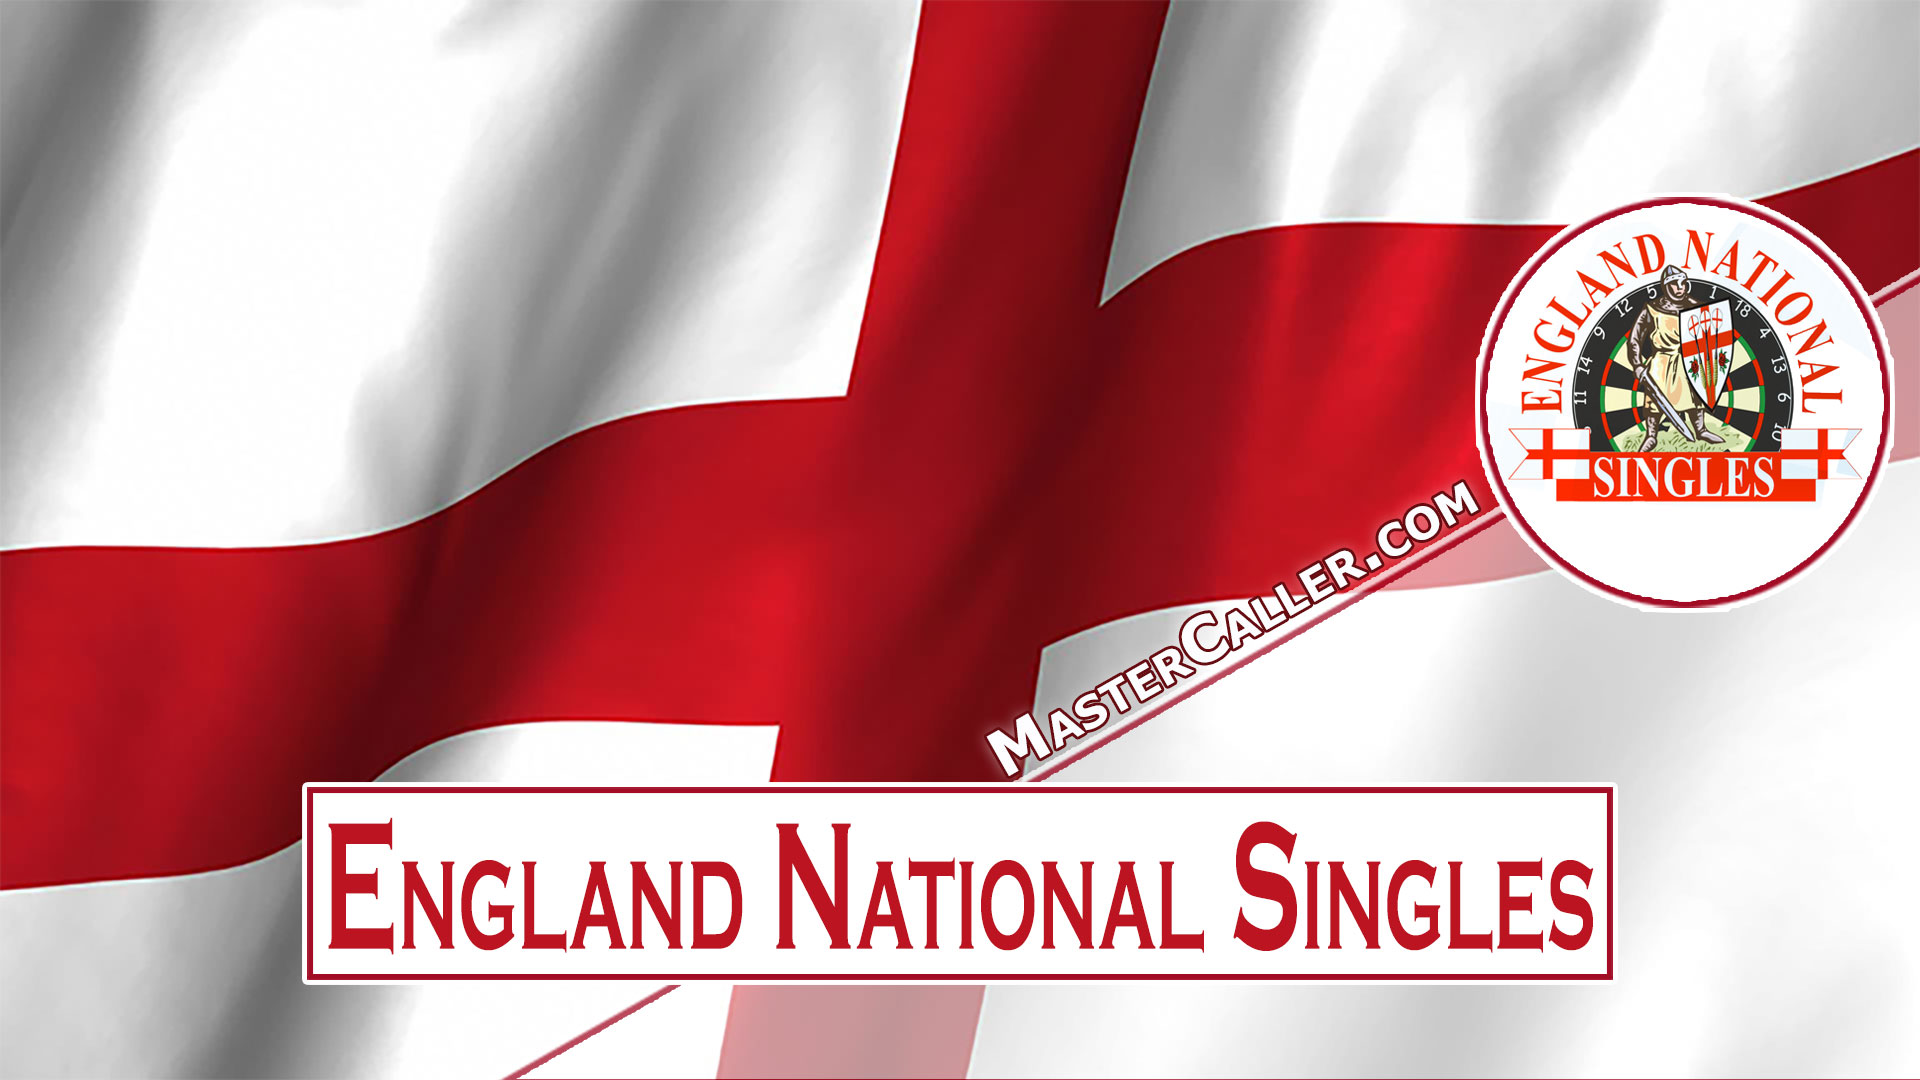 England National Singles Boys - 2021 Logo